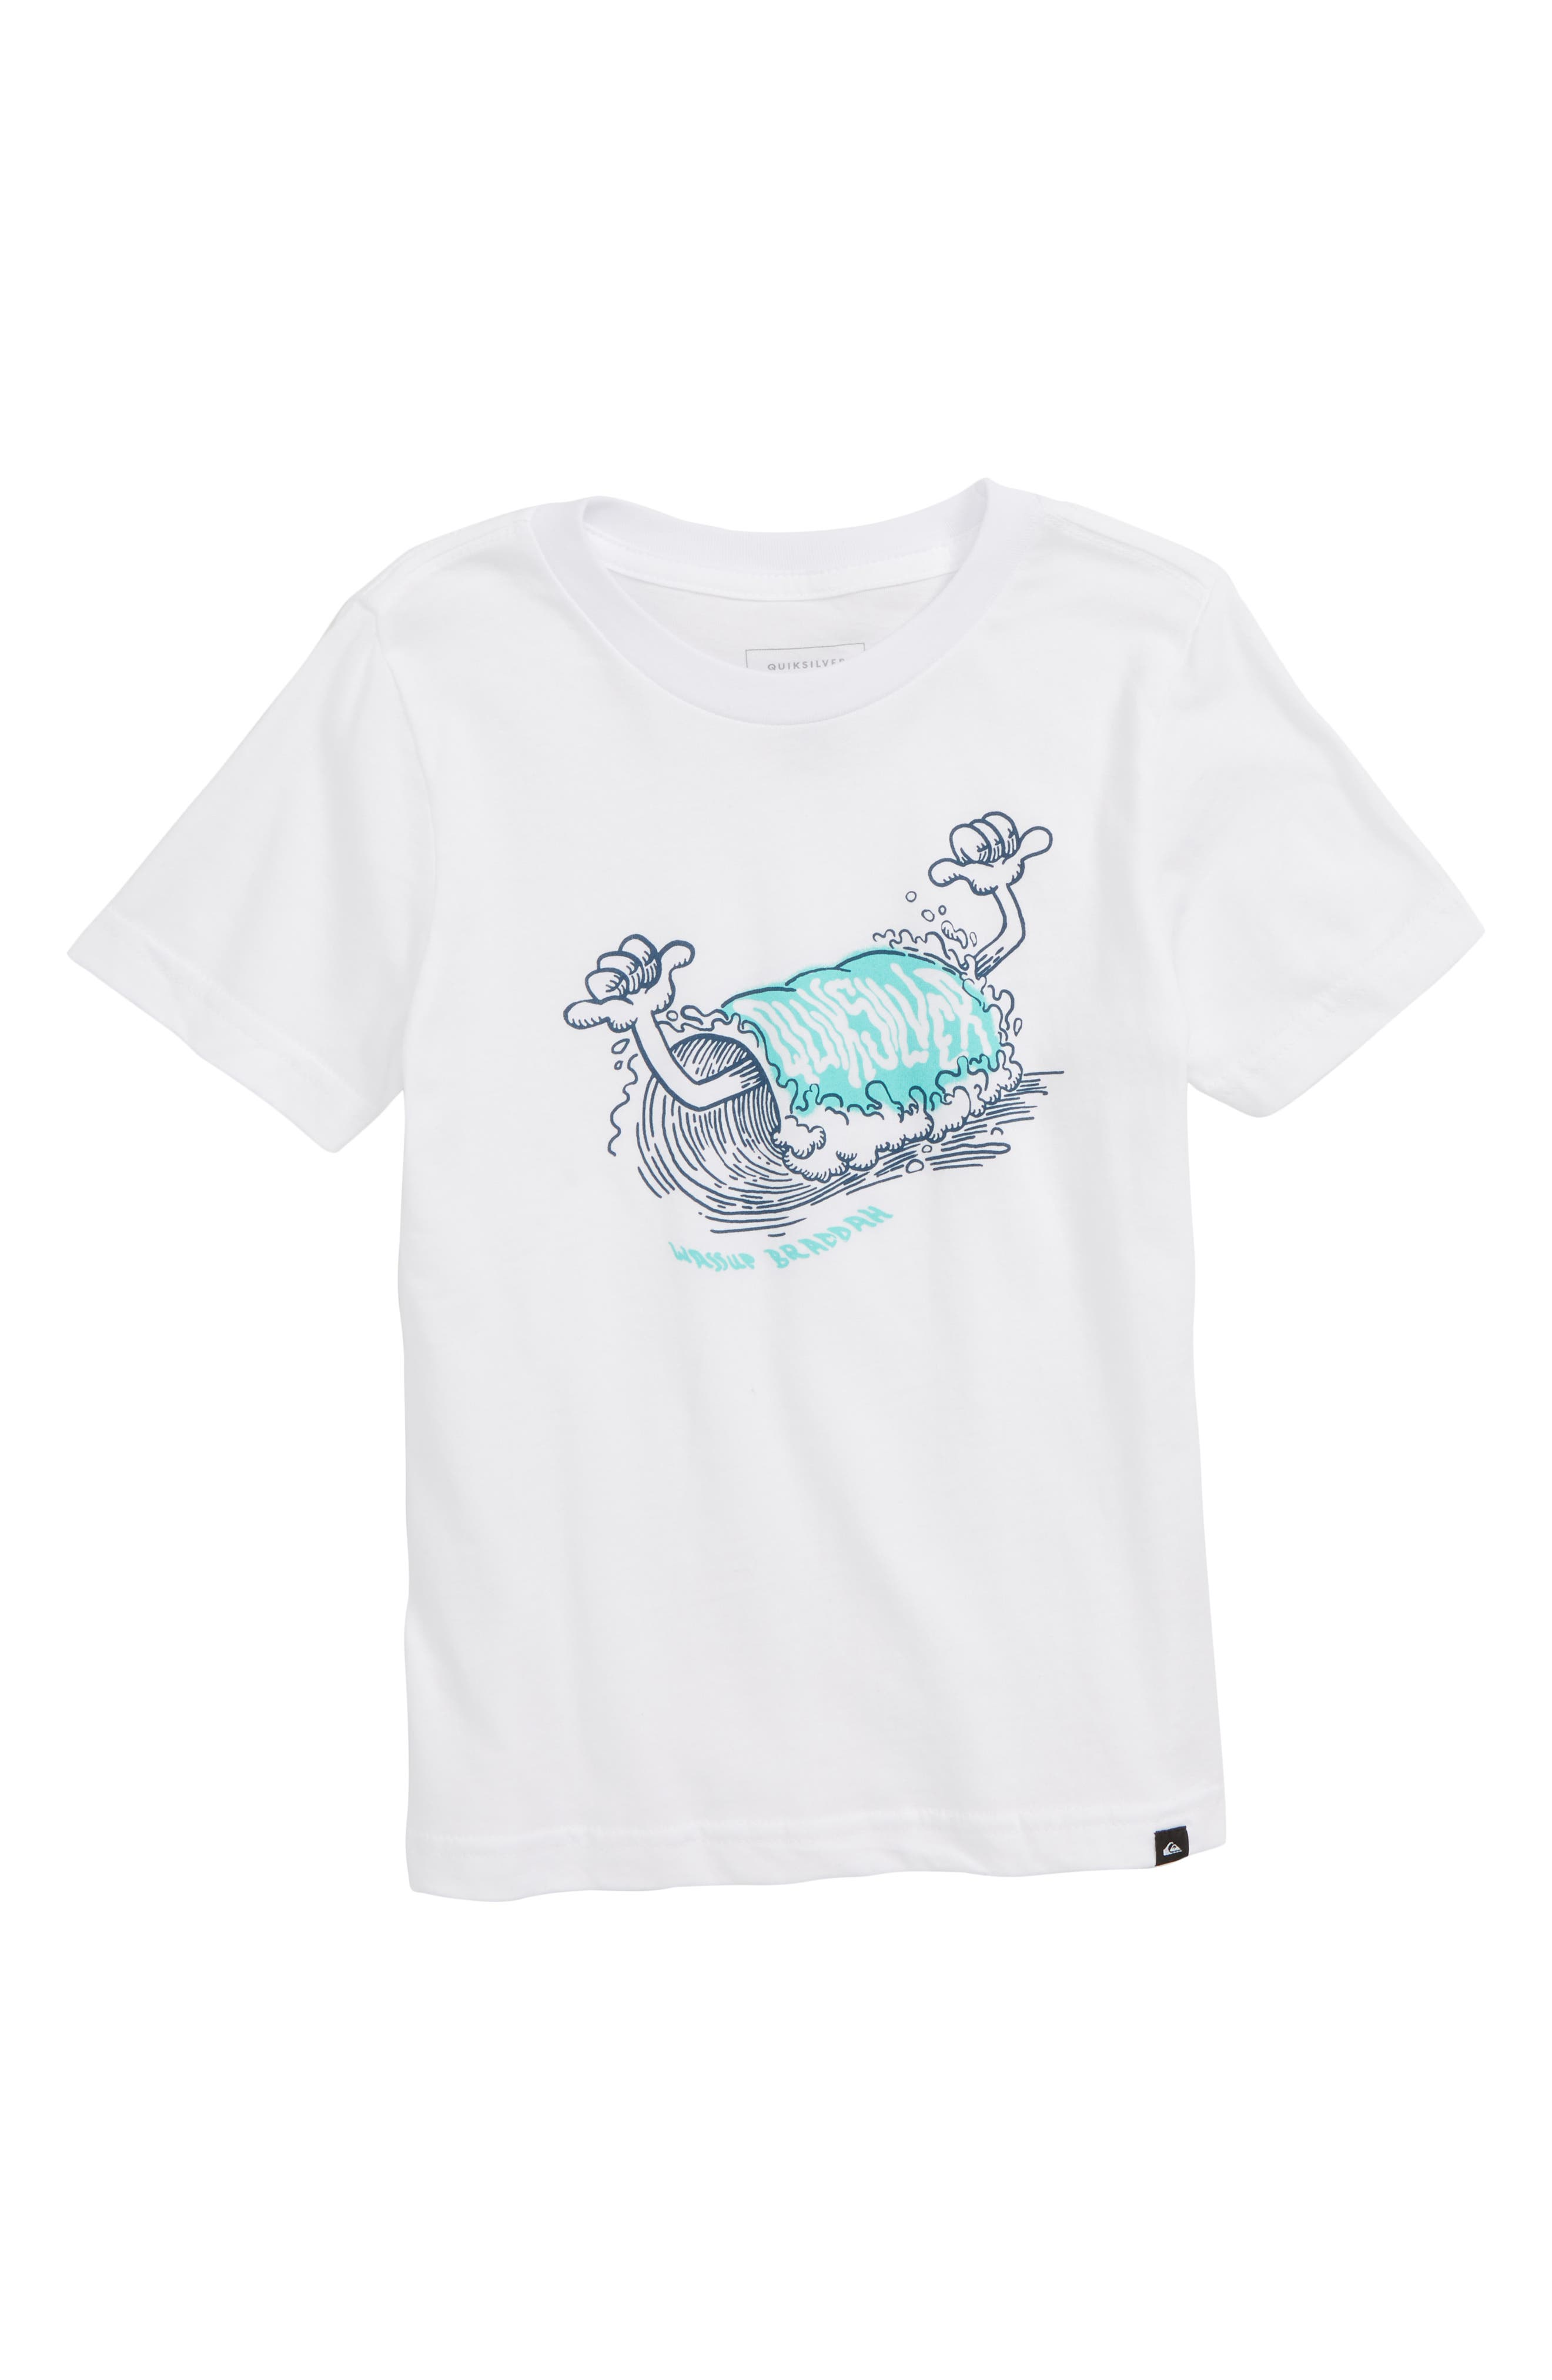 QUIKSILVER, Wassup Braddah T-Shirt, Main thumbnail 1, color, WHITE